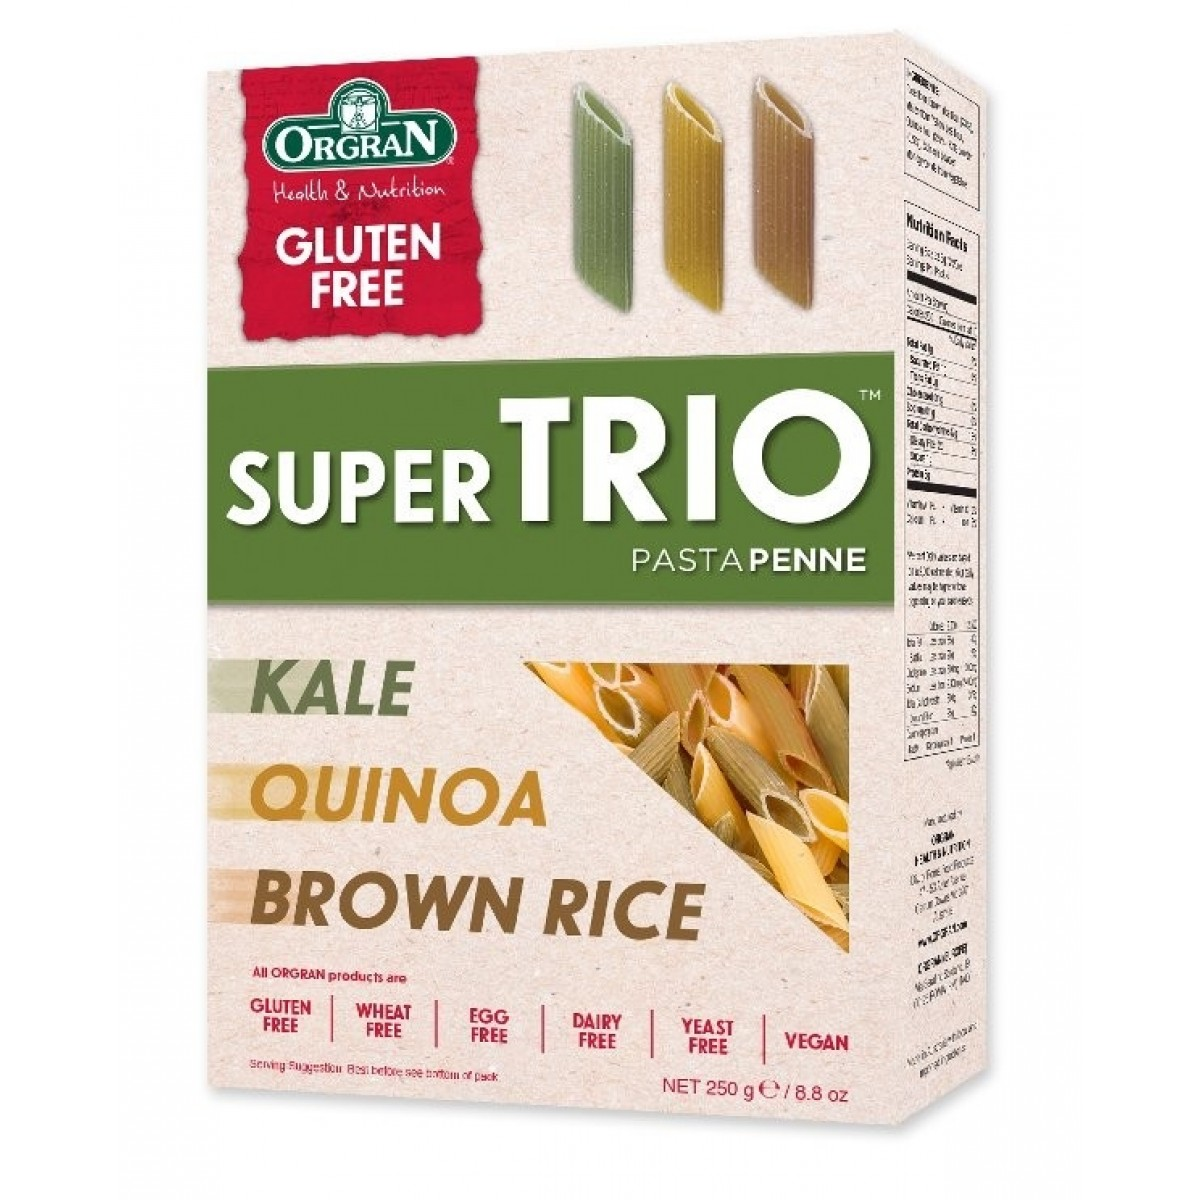 Super Trio Pasta Penne